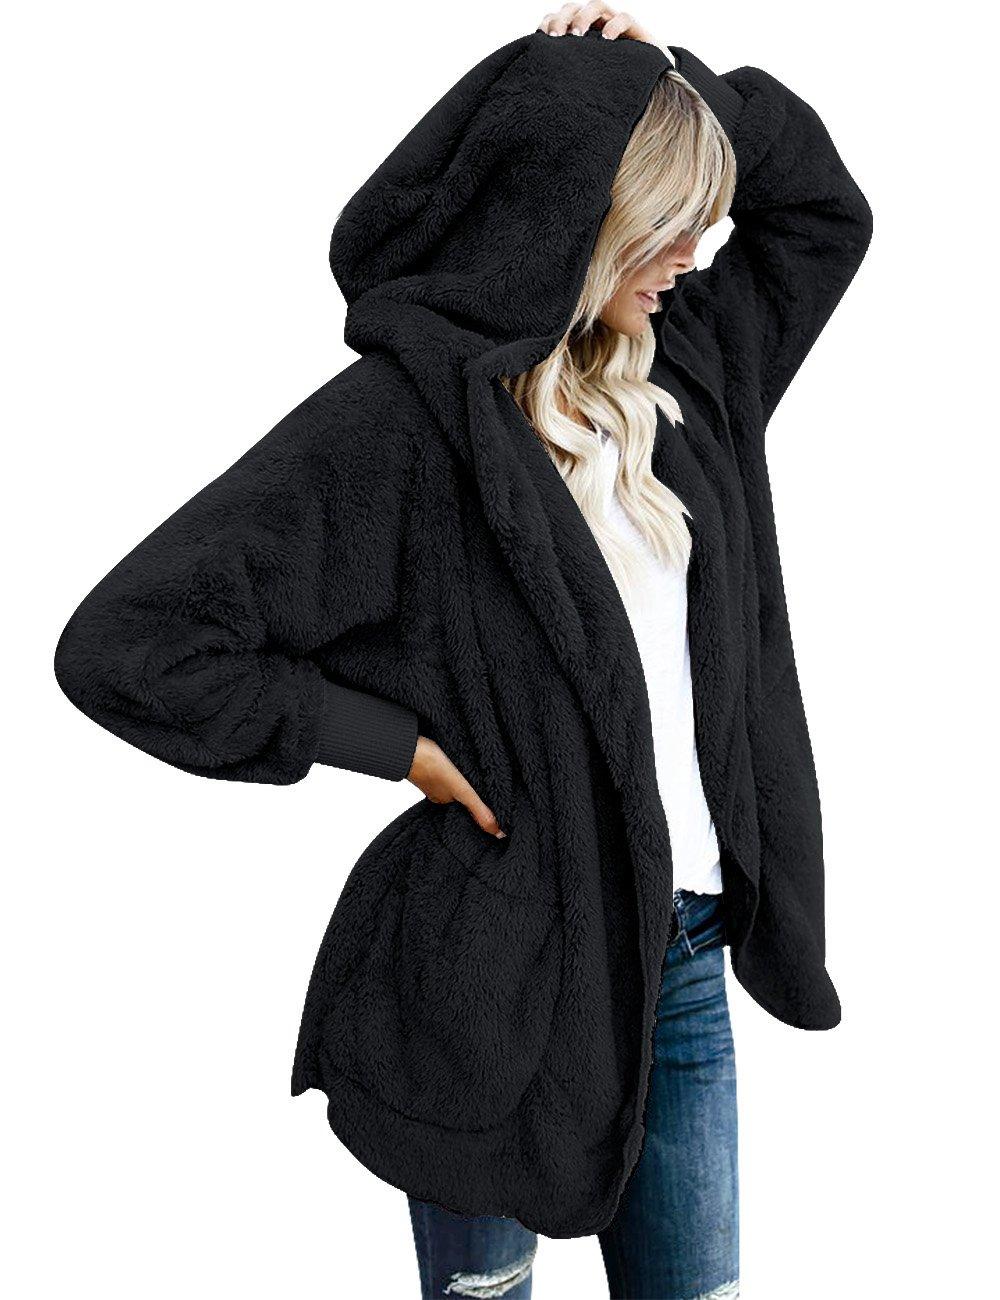 Lookbook Store Women's Oversized Open Front Hooded Draped Pocket Cardigan Coat Black Size XL (Fit US 16 - US 18)